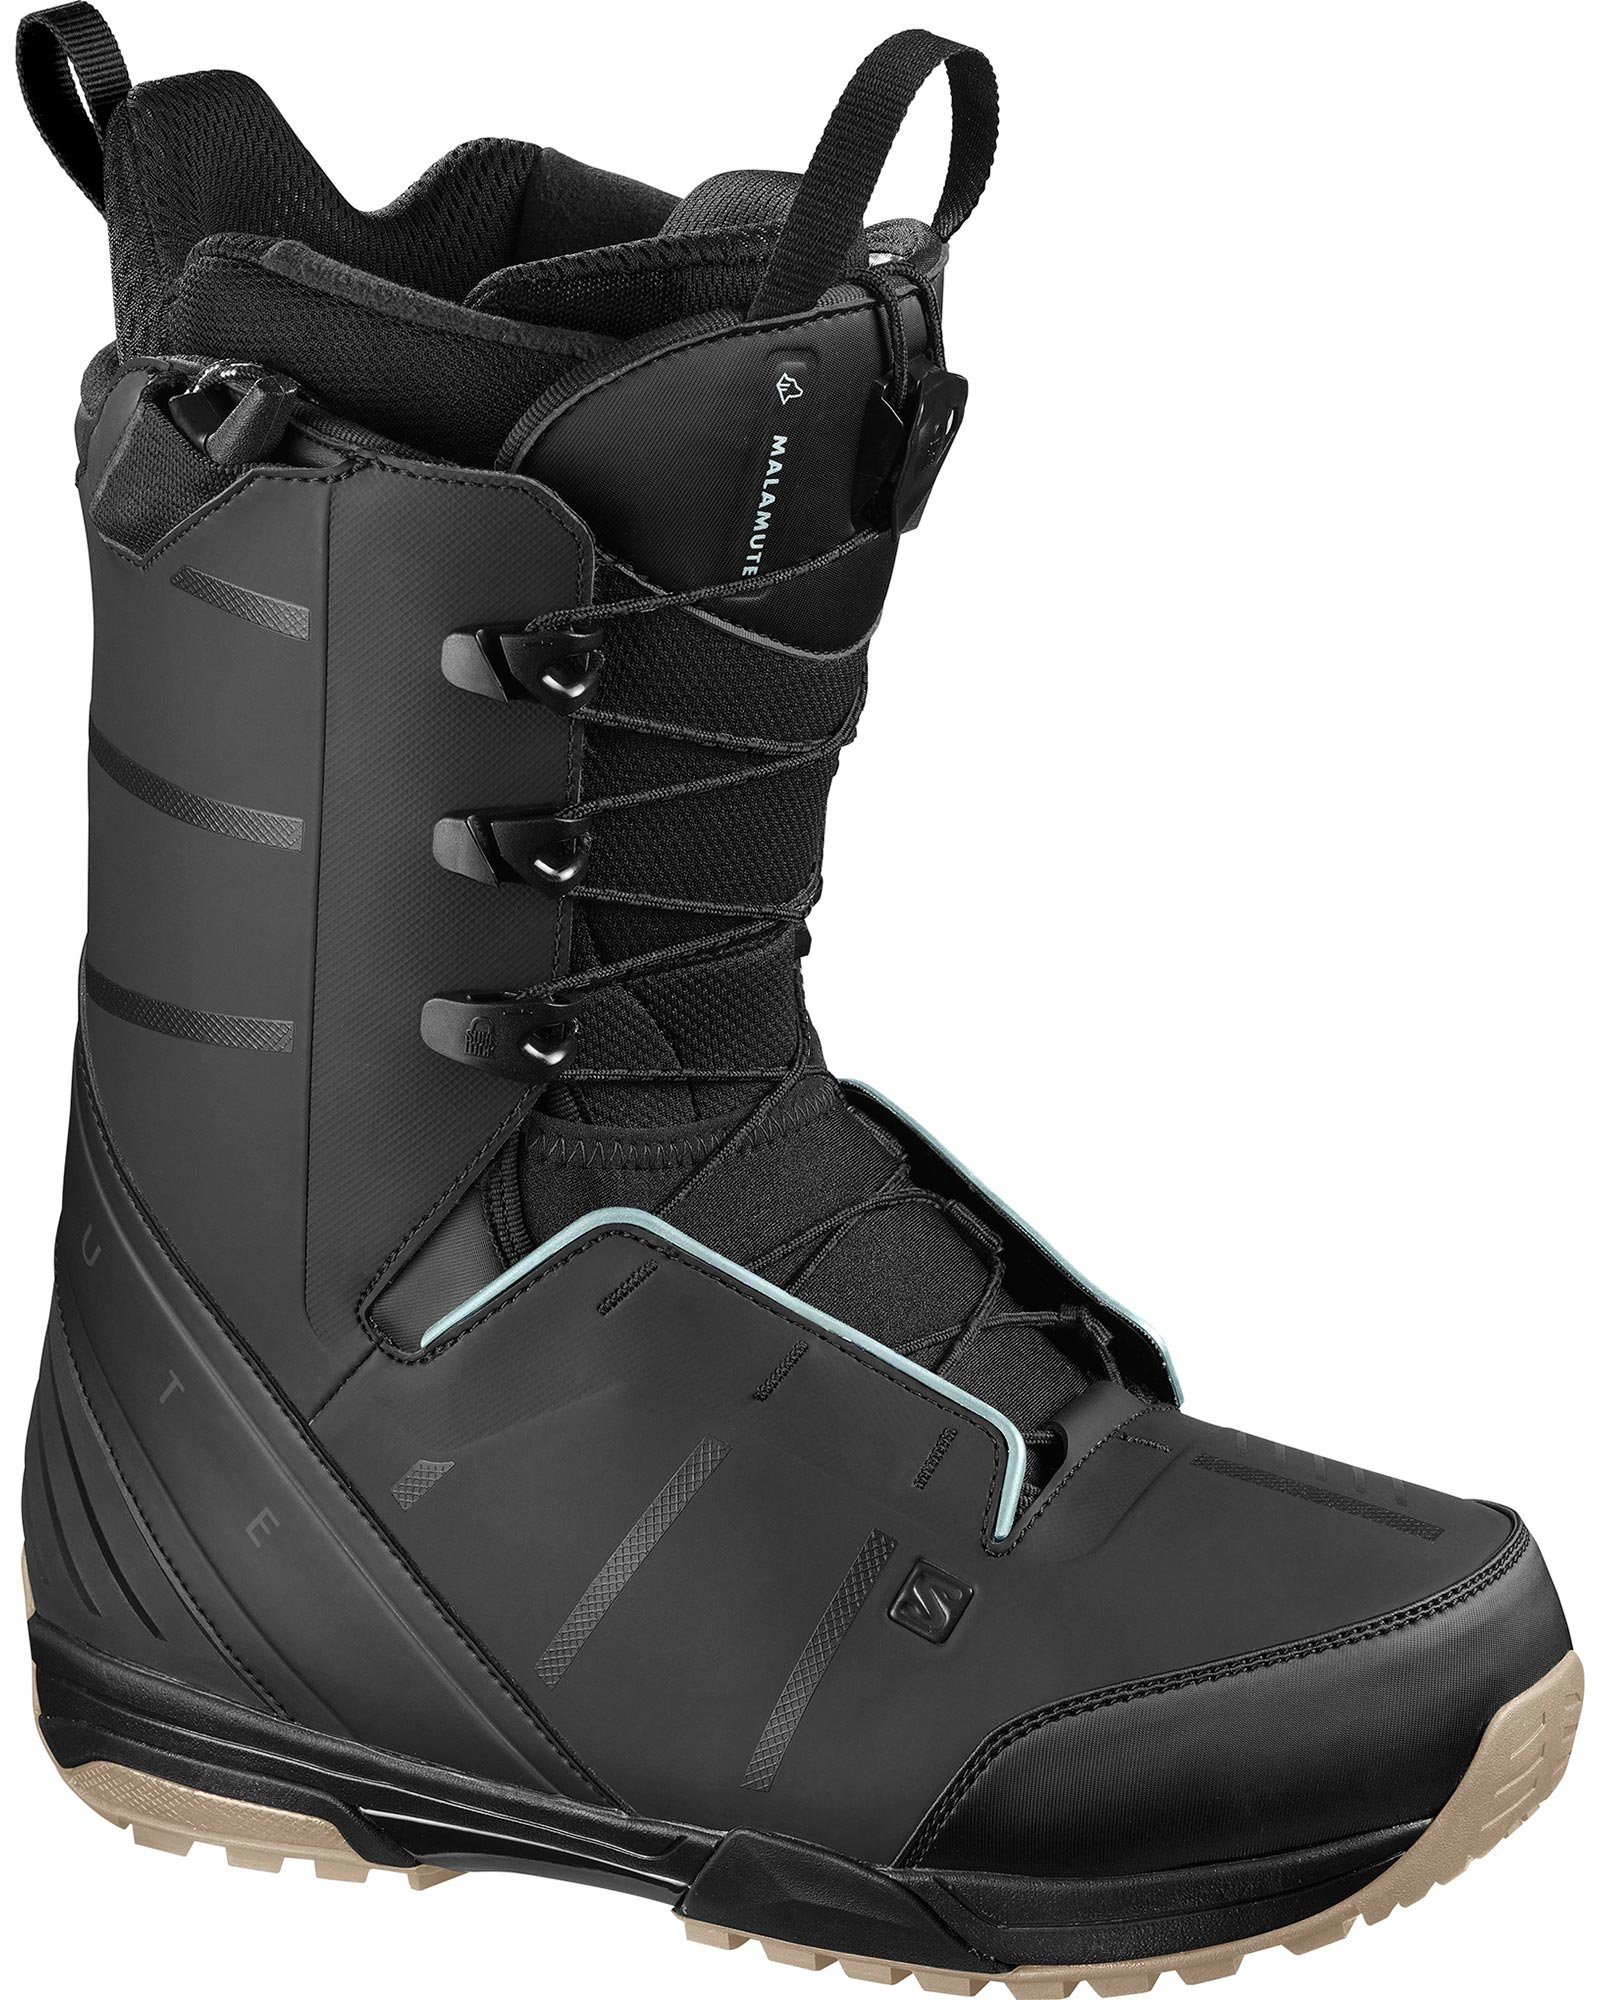 Salomon Snowboards Men's Malamute Snowboard Boots 2020 / 2021 0